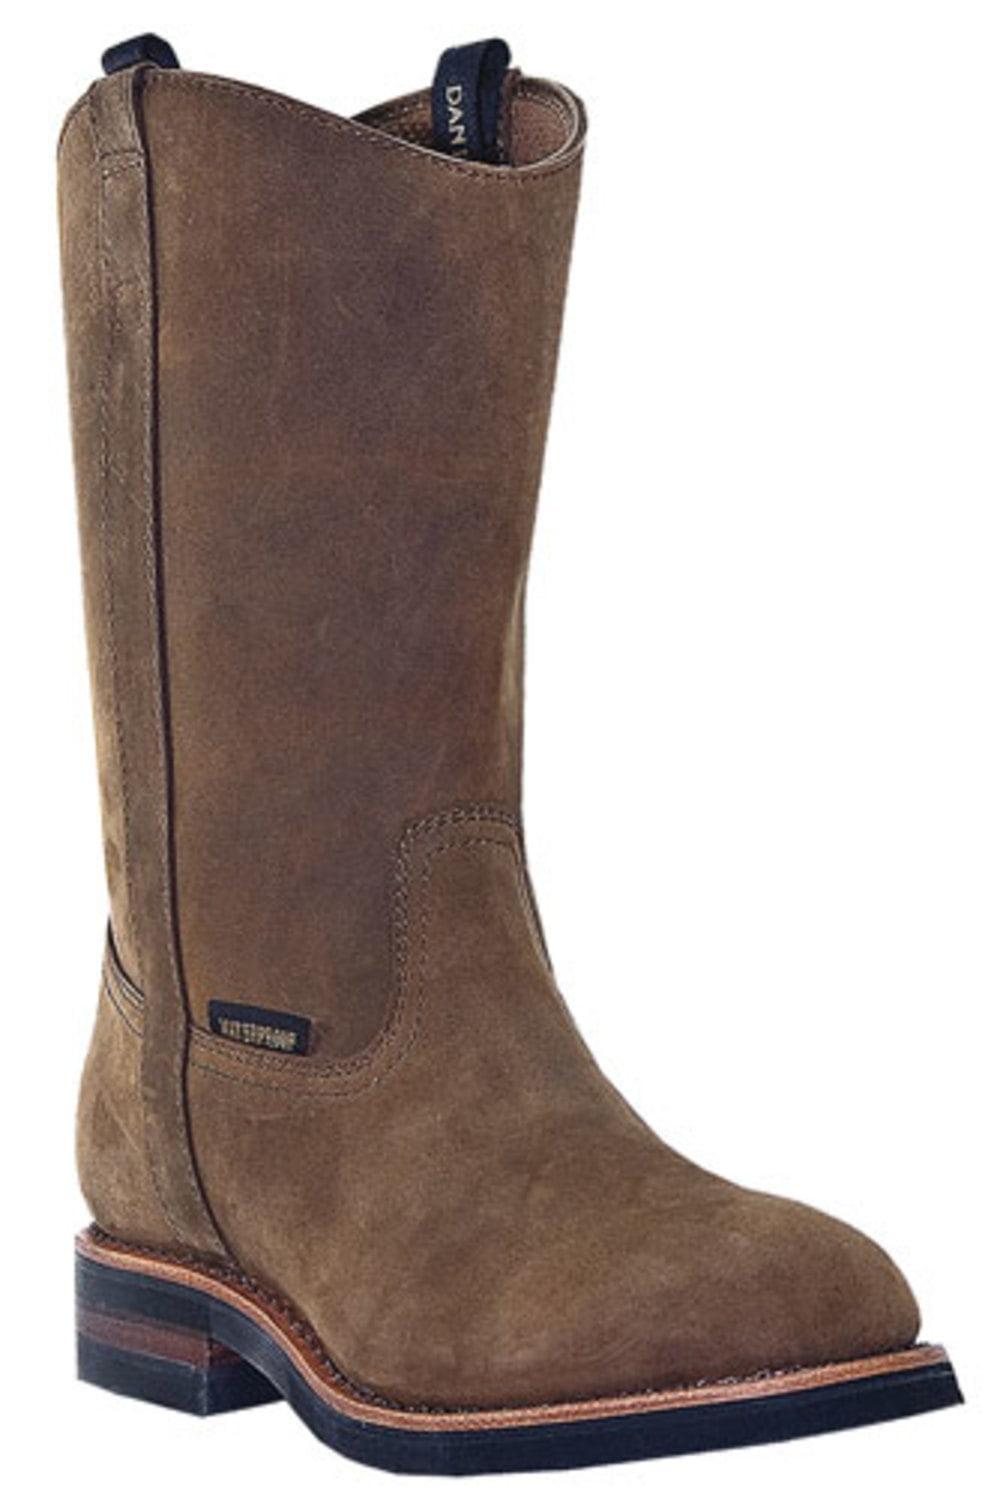 Men's Dan Post WP Leather Wellington Boots TAN 9 EW